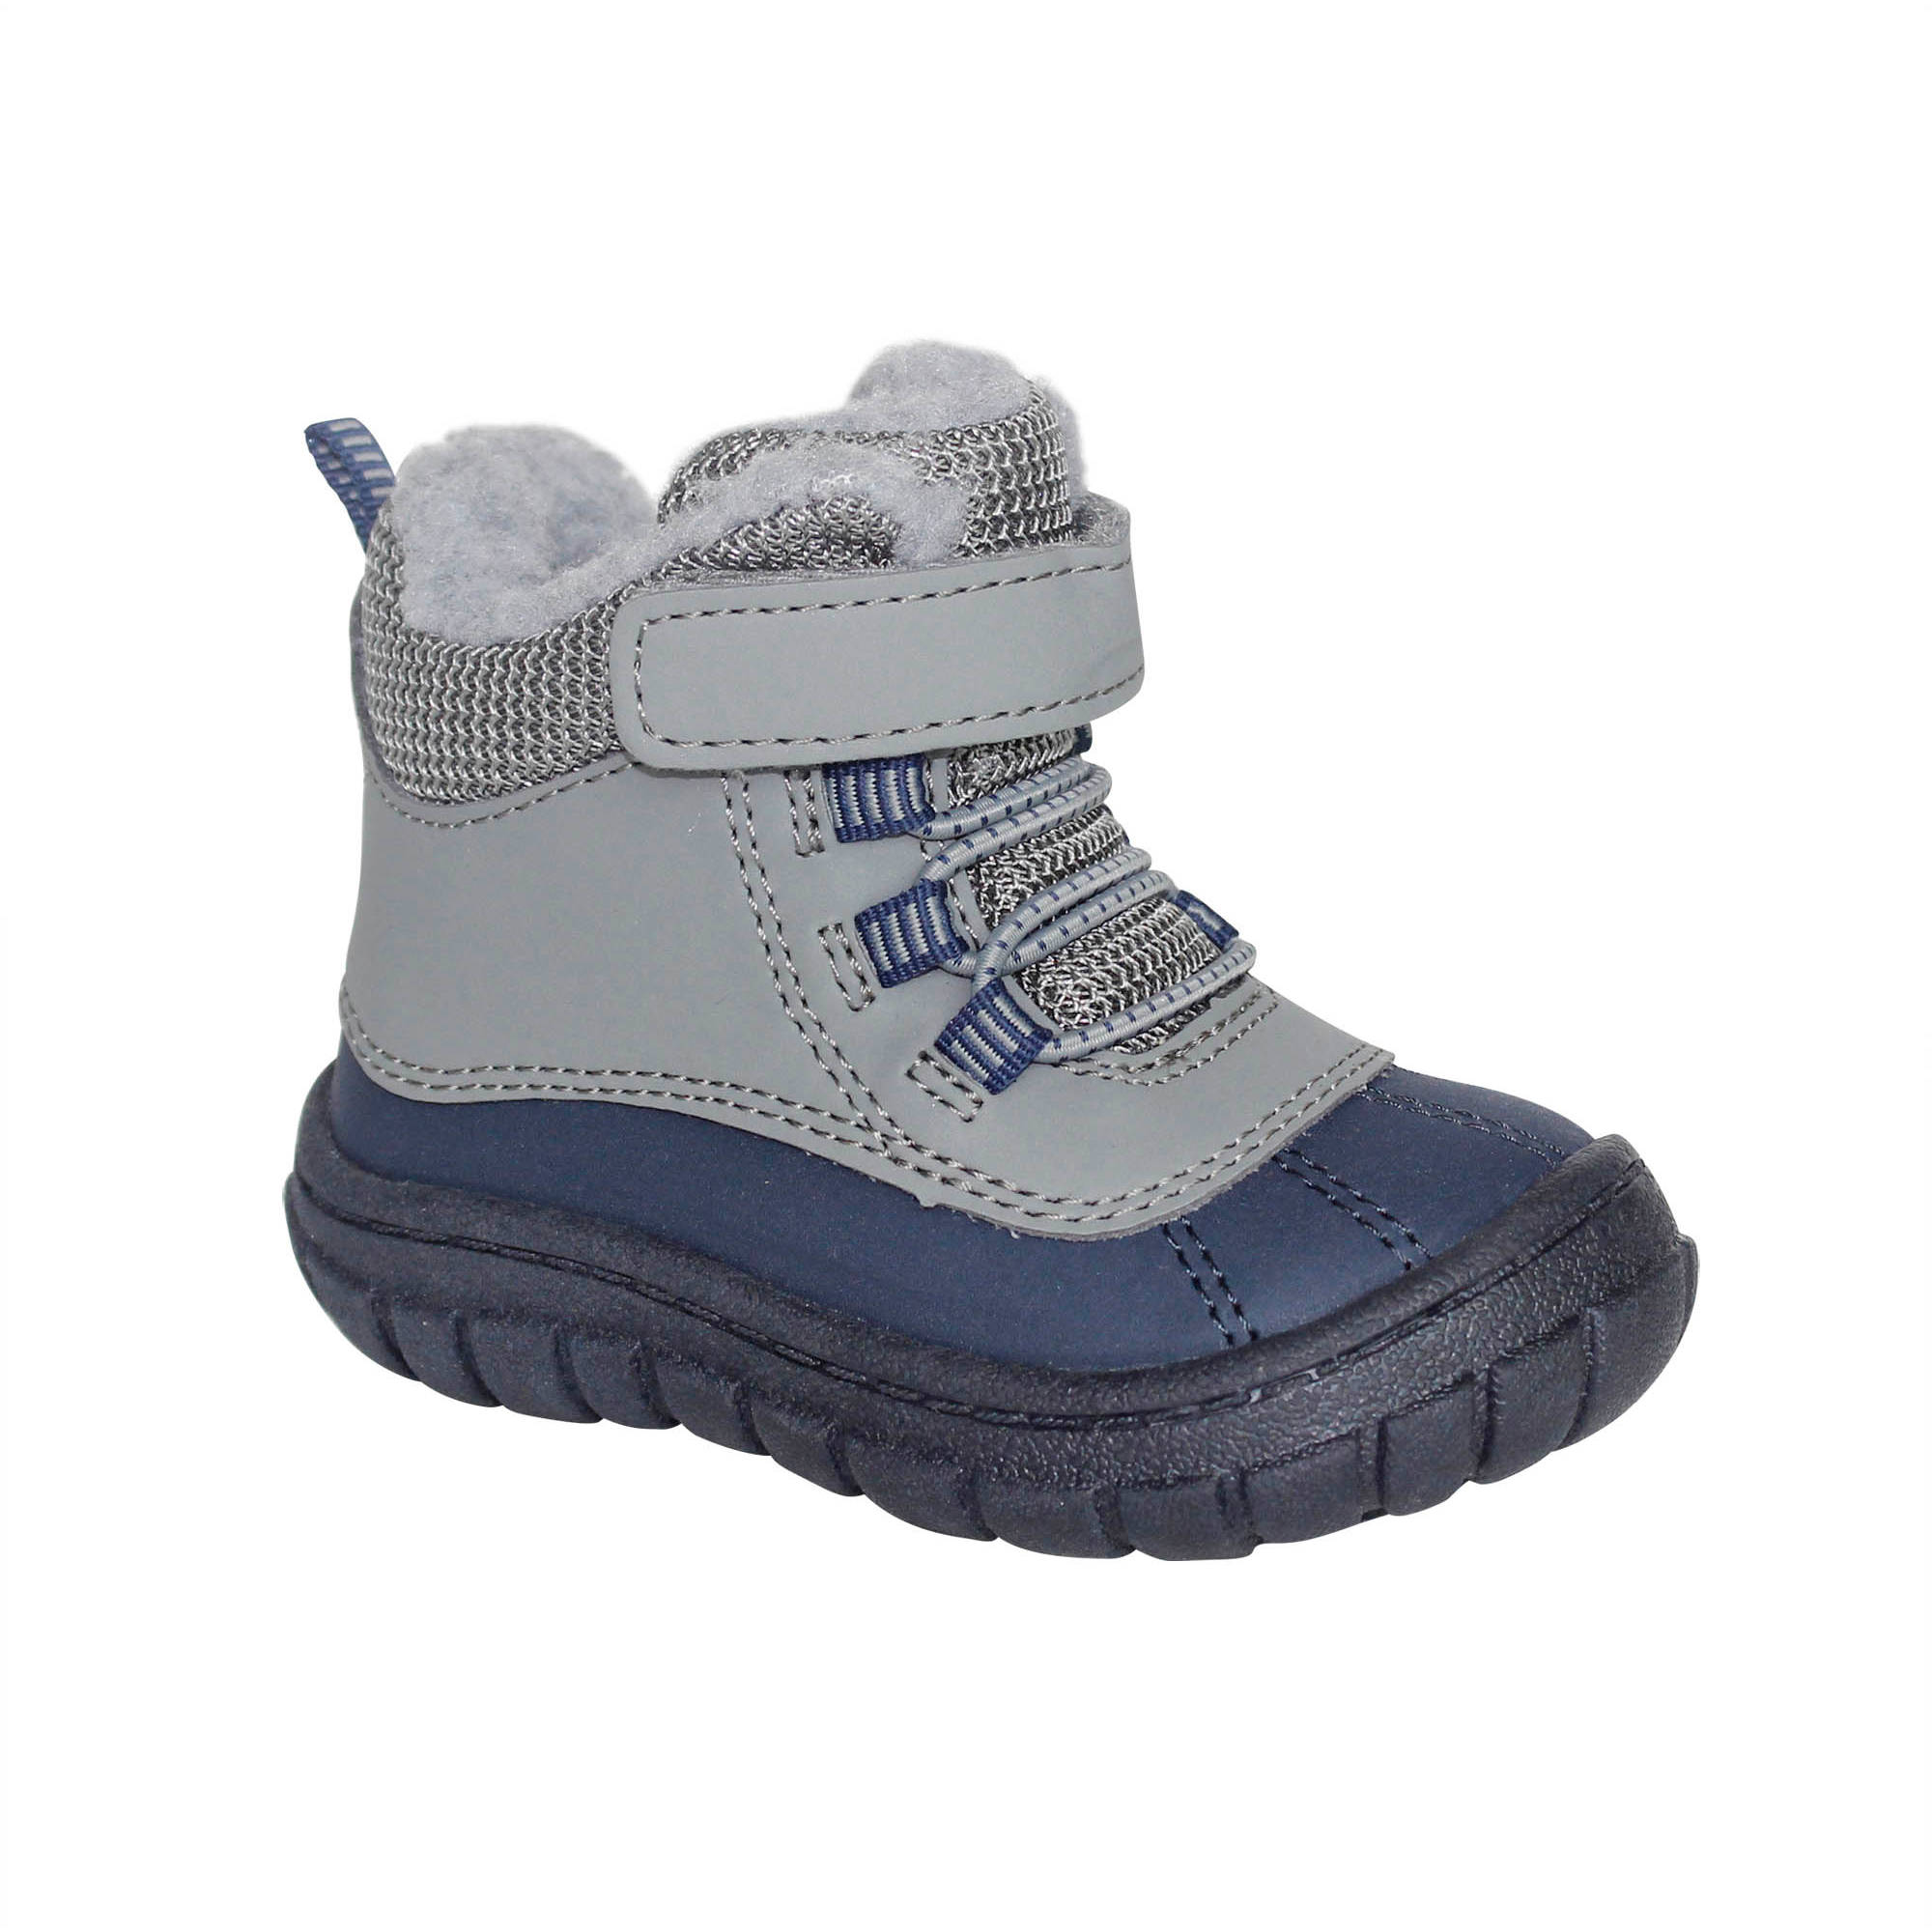 Garanimals Infant Boys Fur Boot